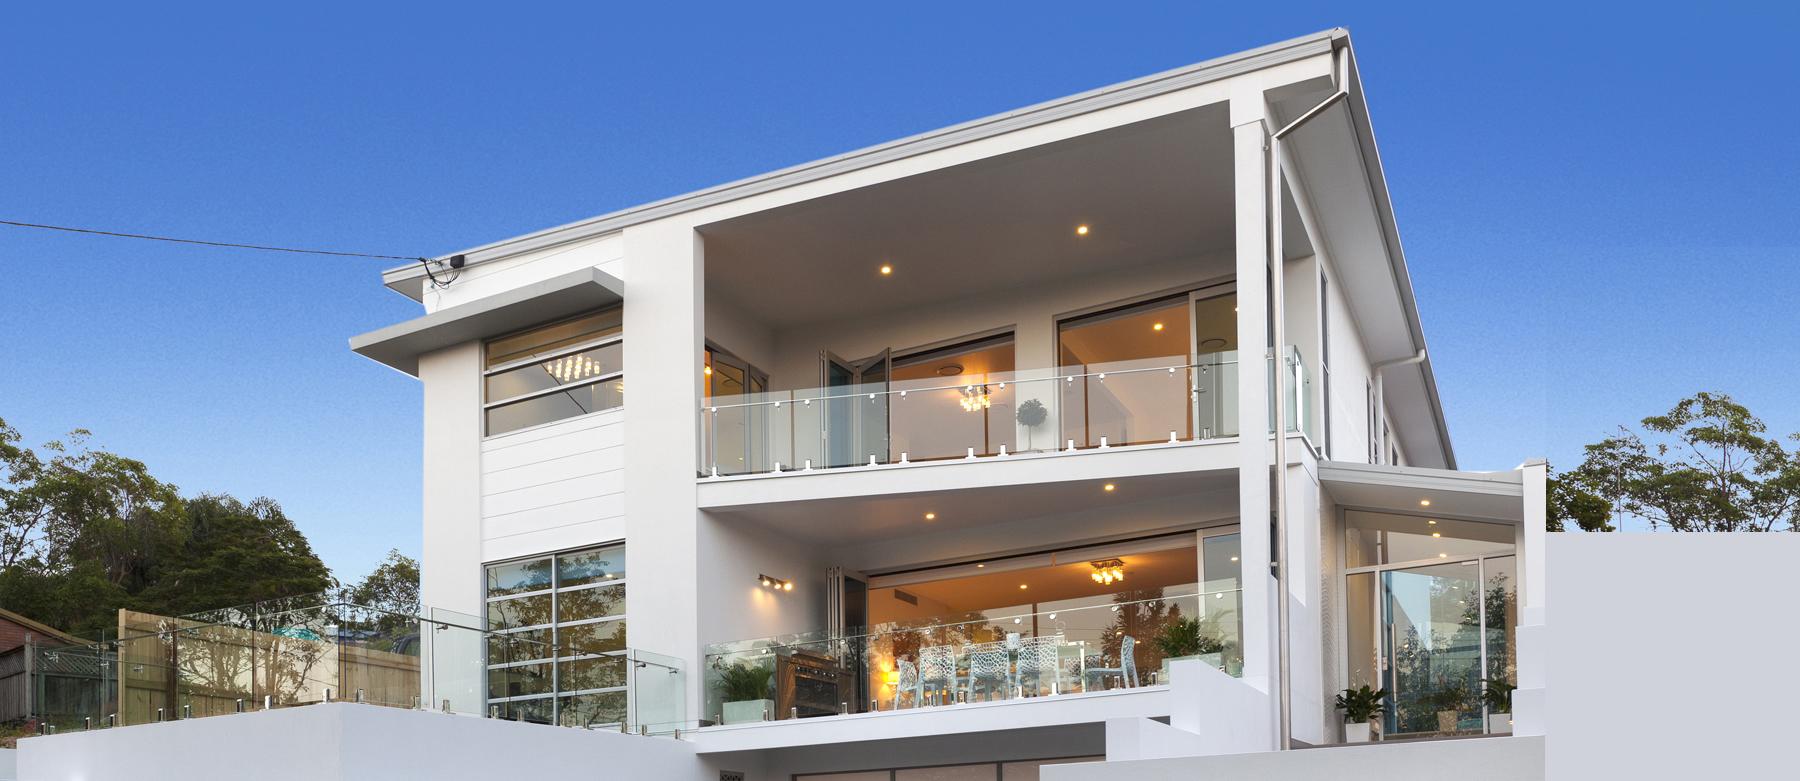 Split level home designs nsw split mobile home design idea for Split level home designs brisbane